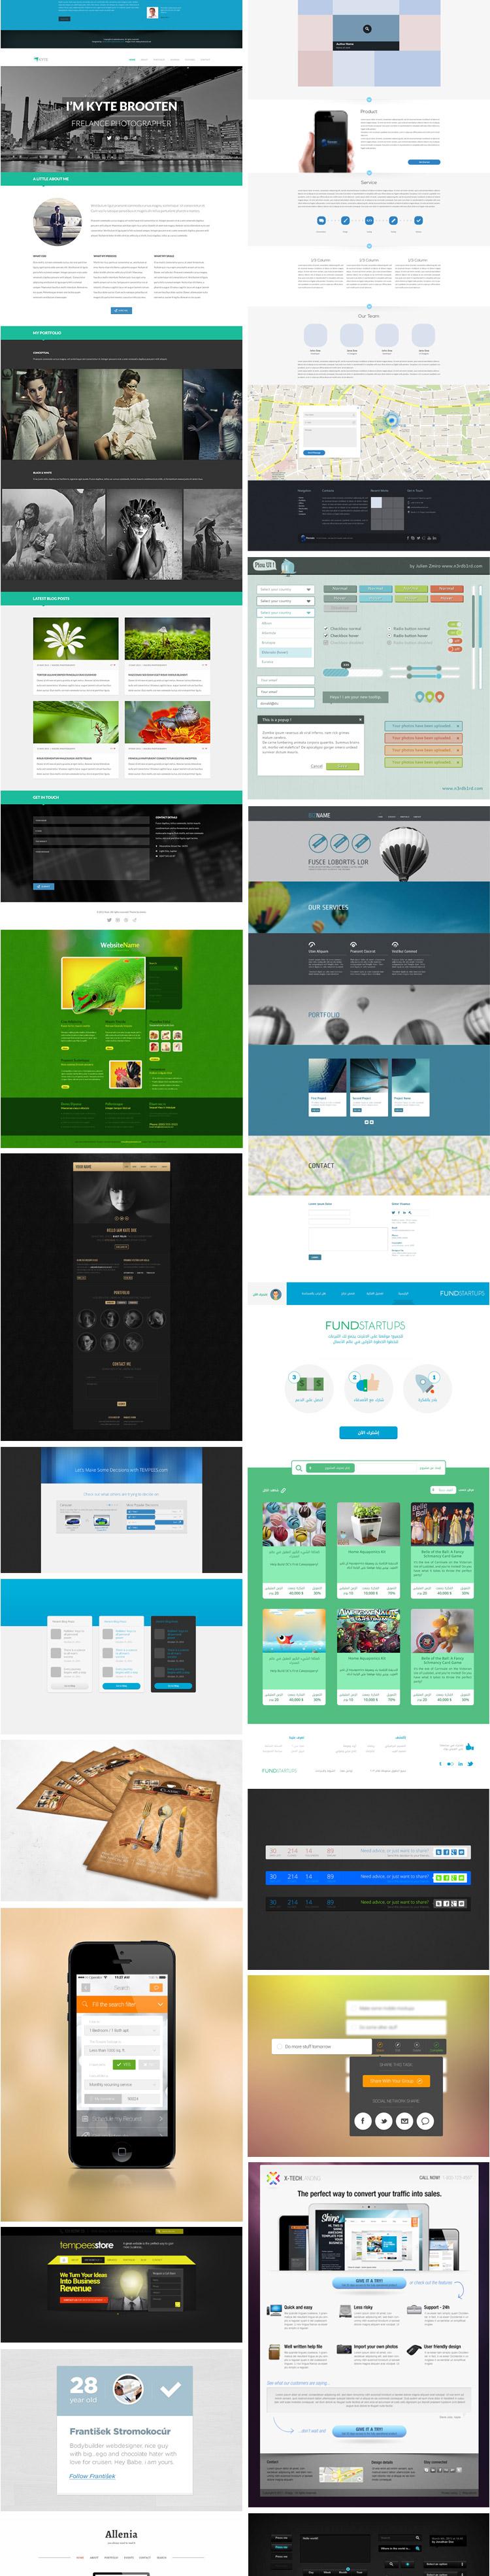 [UI社出品]5G精选UI设计素材,手机UI界面 psd素材,网站模板-第三季 素材包-第4张